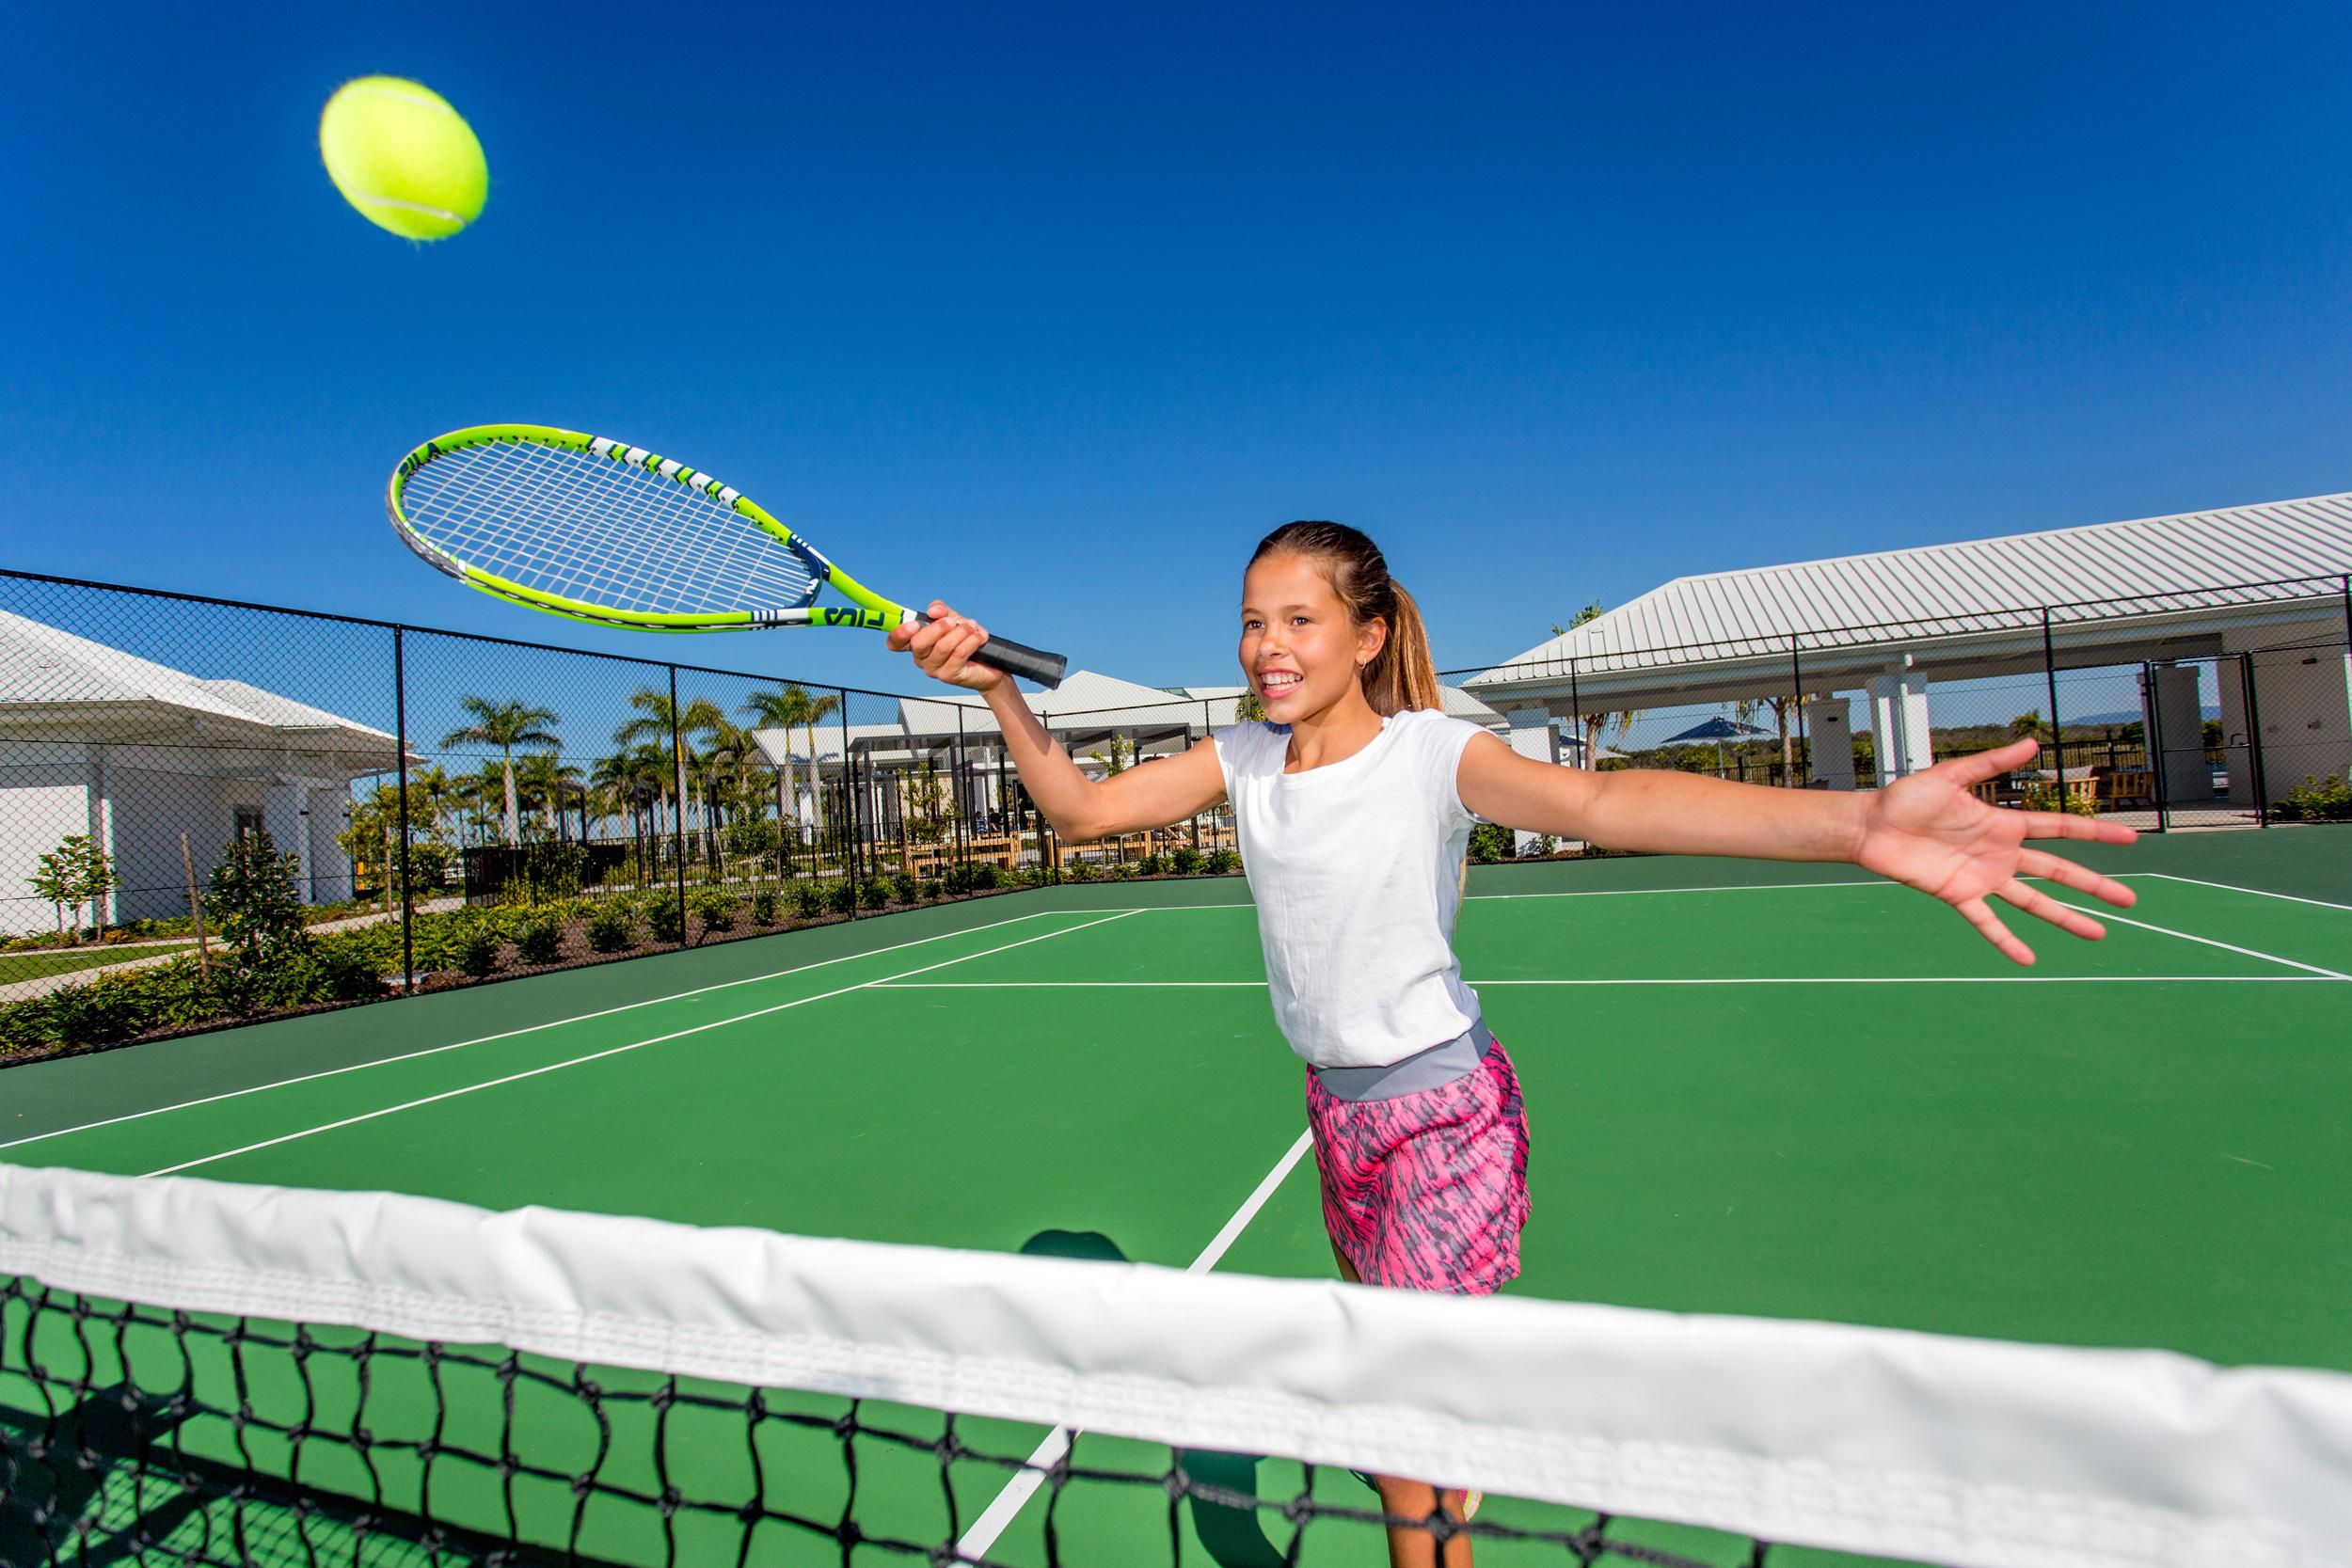 advertising-photography-tennis.jpg